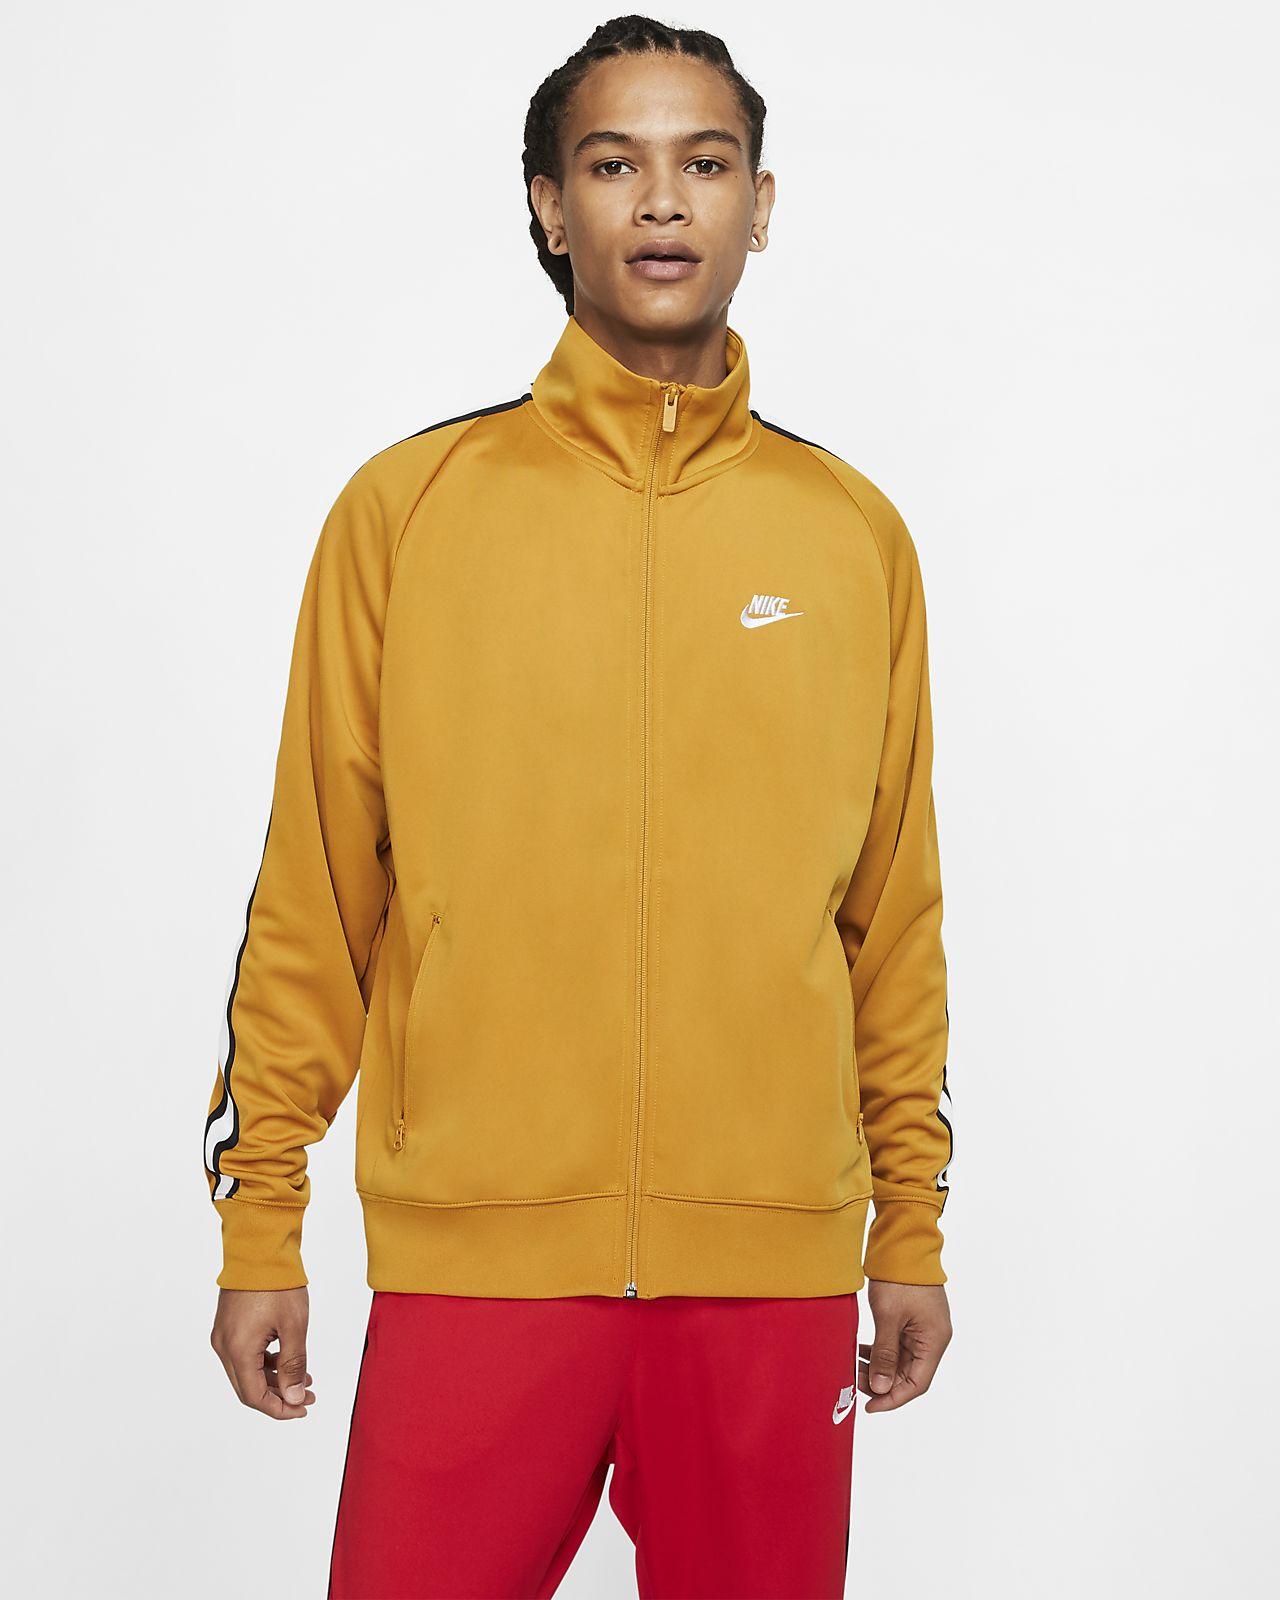 Giacca da riscaldamento in maglia Nike Sportswear N98 - Uomo